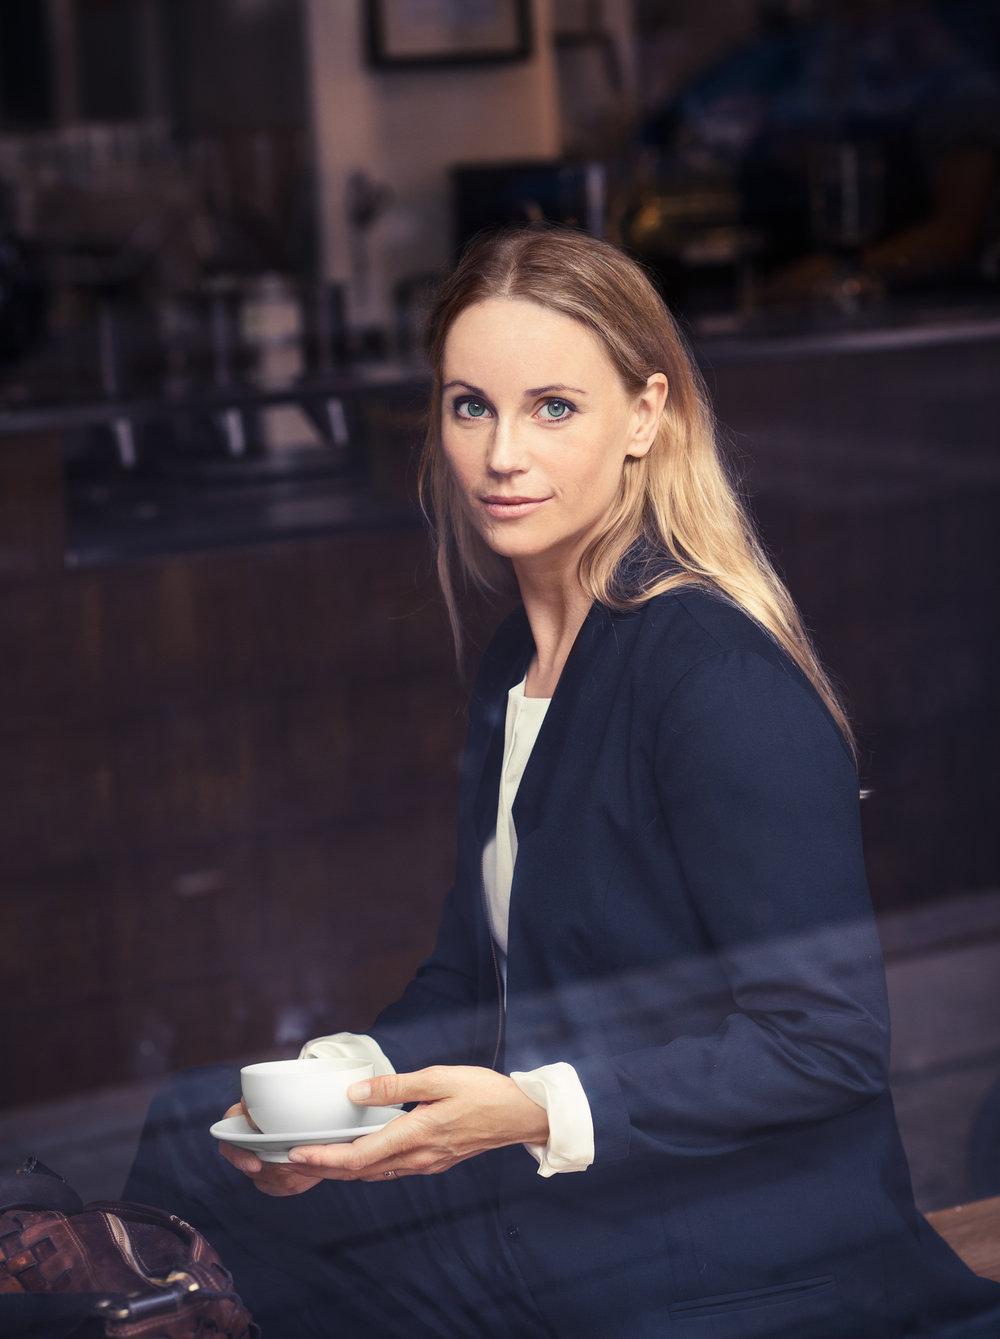 portraits_image__Kristofer Samuelsson Photography 2014-284.jpg